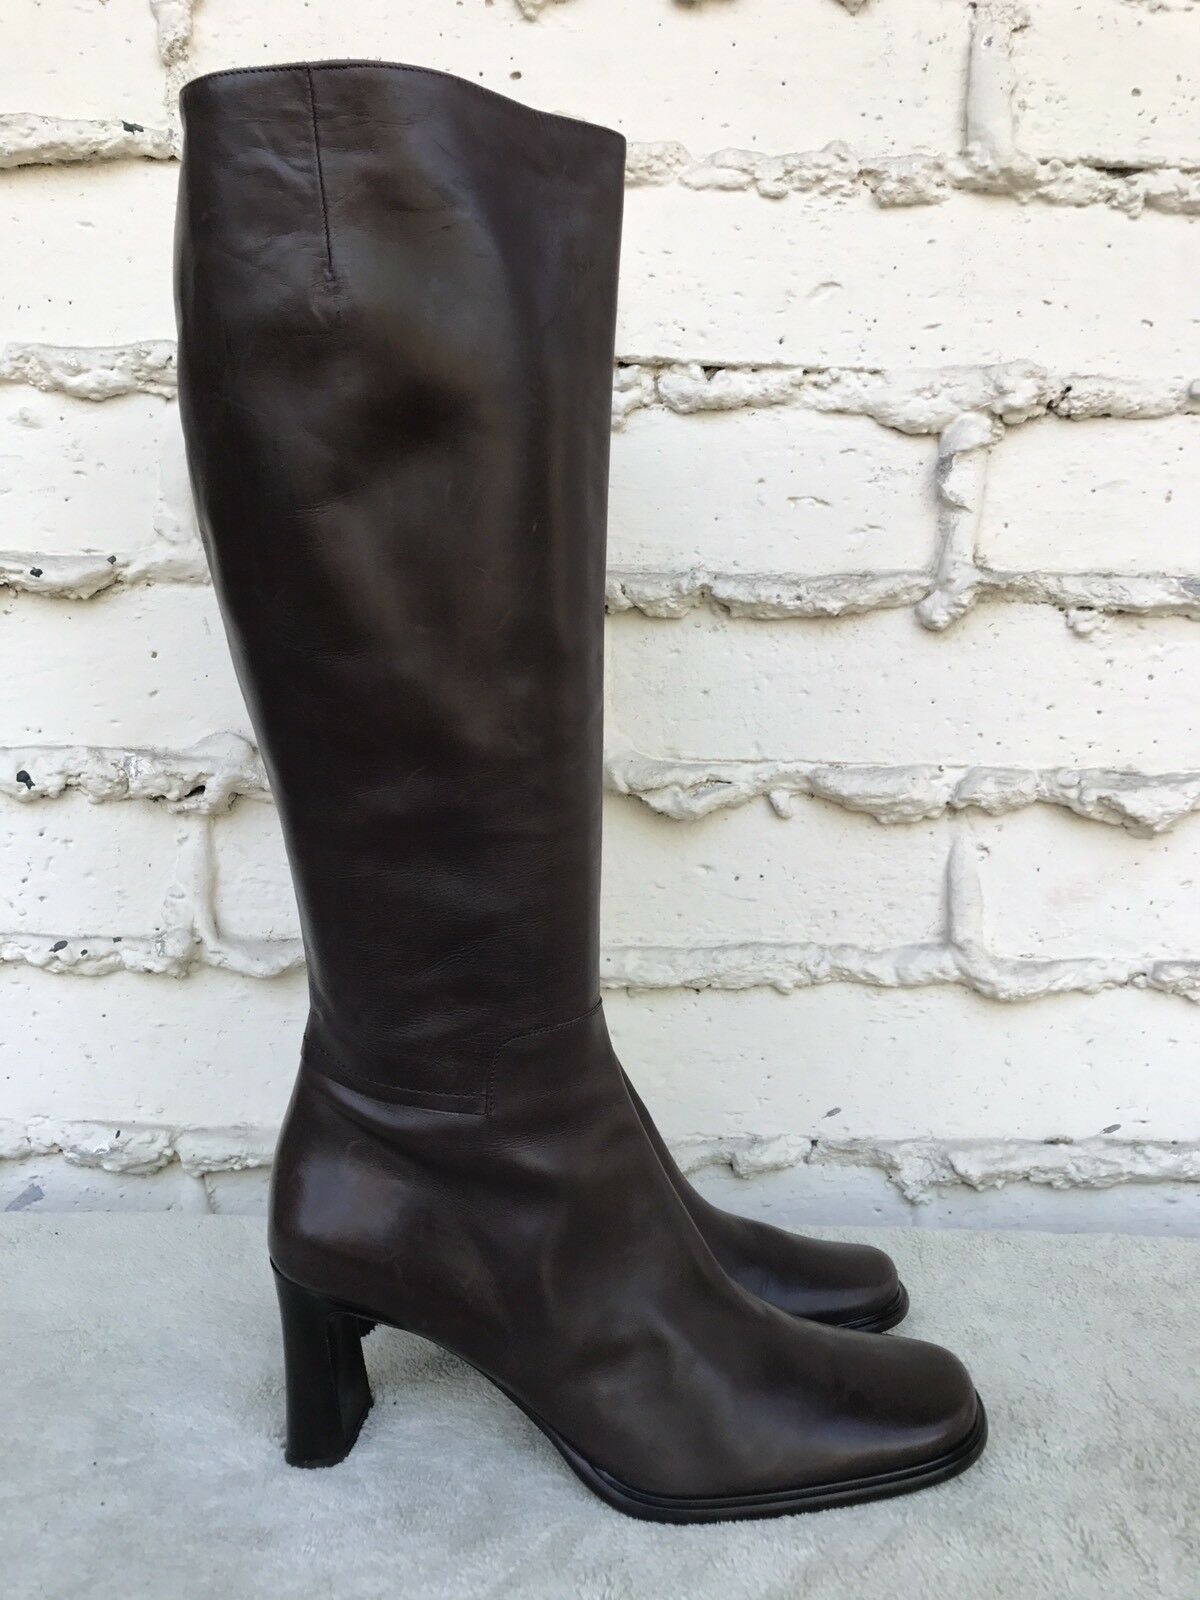 Via Spiga Brown Leather Zip Knee High Heel Fashion Boots Womens Size US 9M